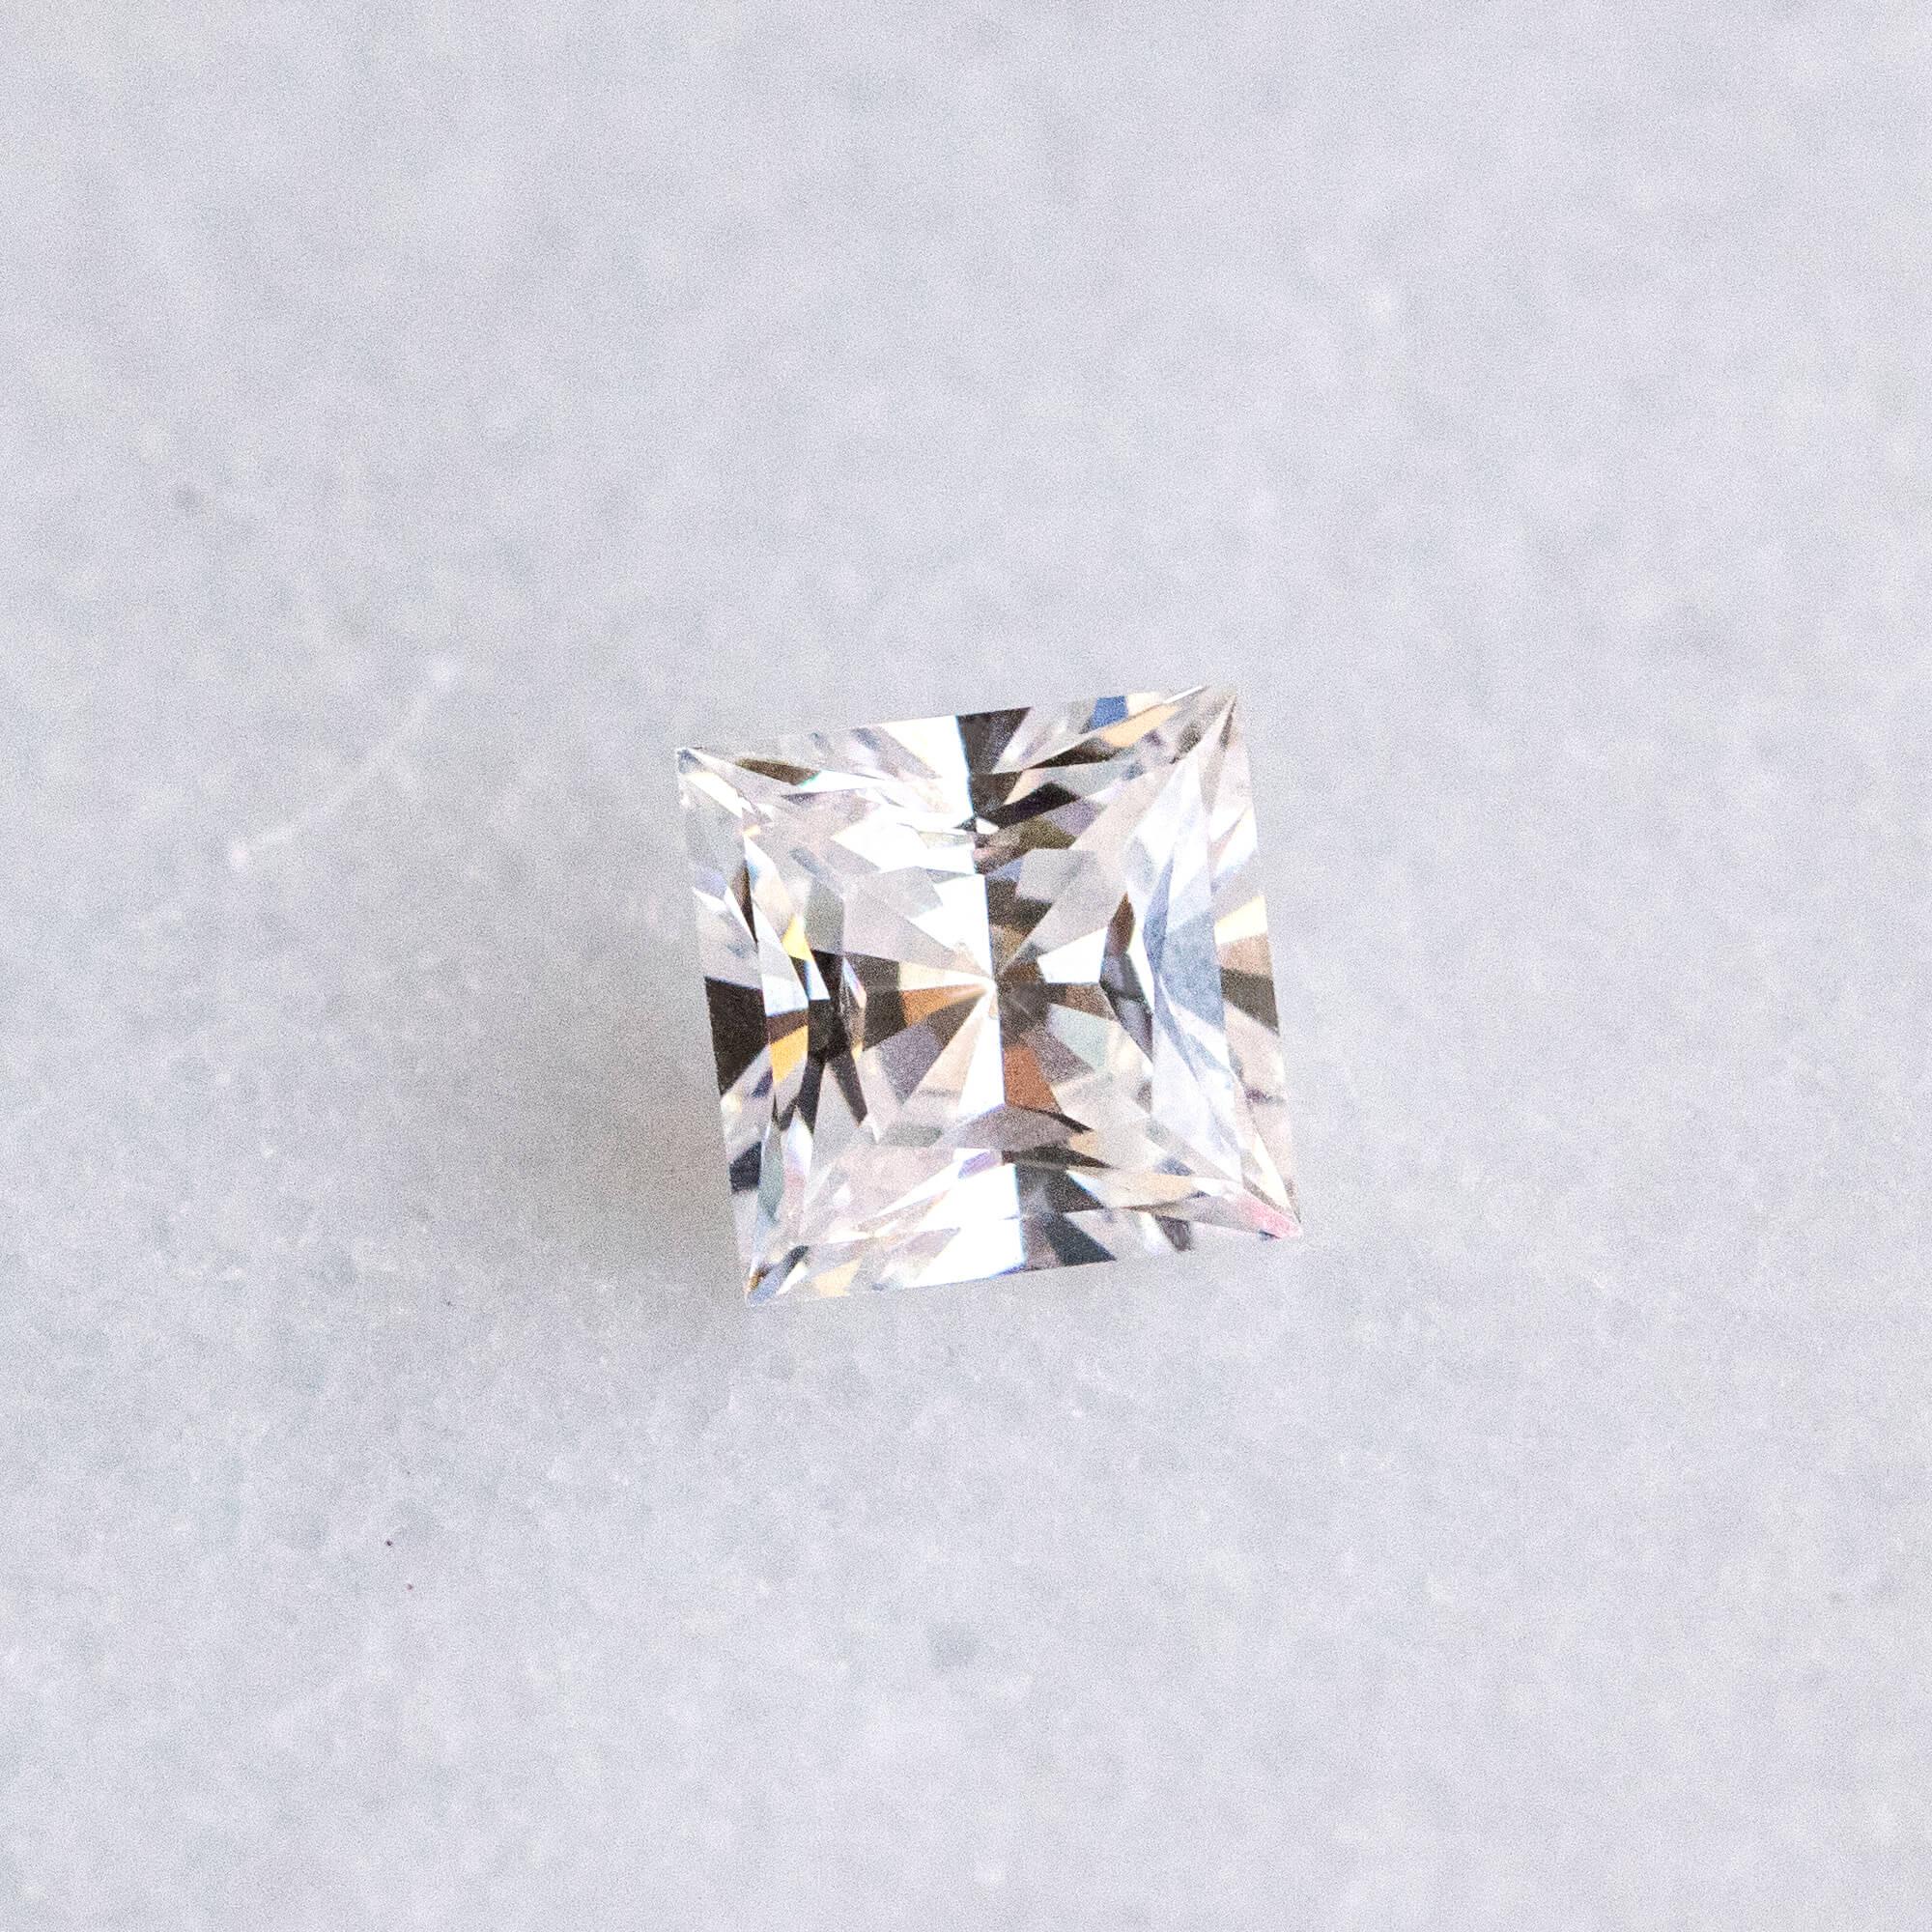 A Princess Nexus Diamond alternative.